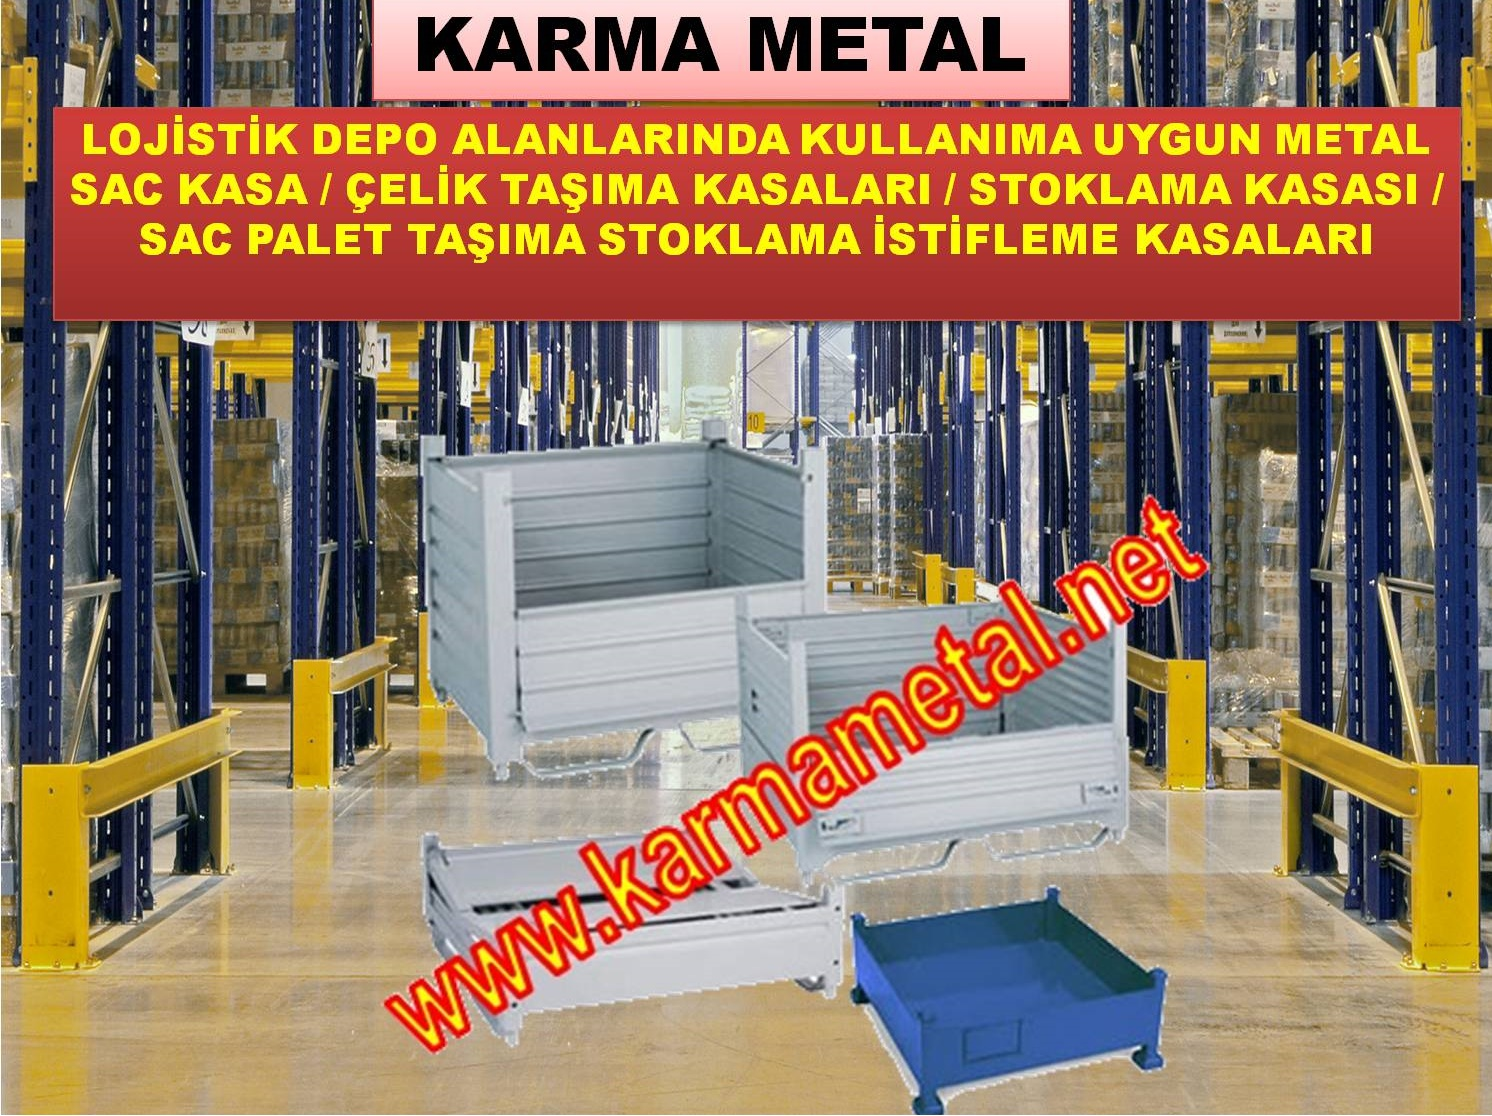 katlanabilir_katlanir__kasa__metal_celik_sac_tasima_stoklama_istifleme__kasasi_kasalari_sandiklari (4)